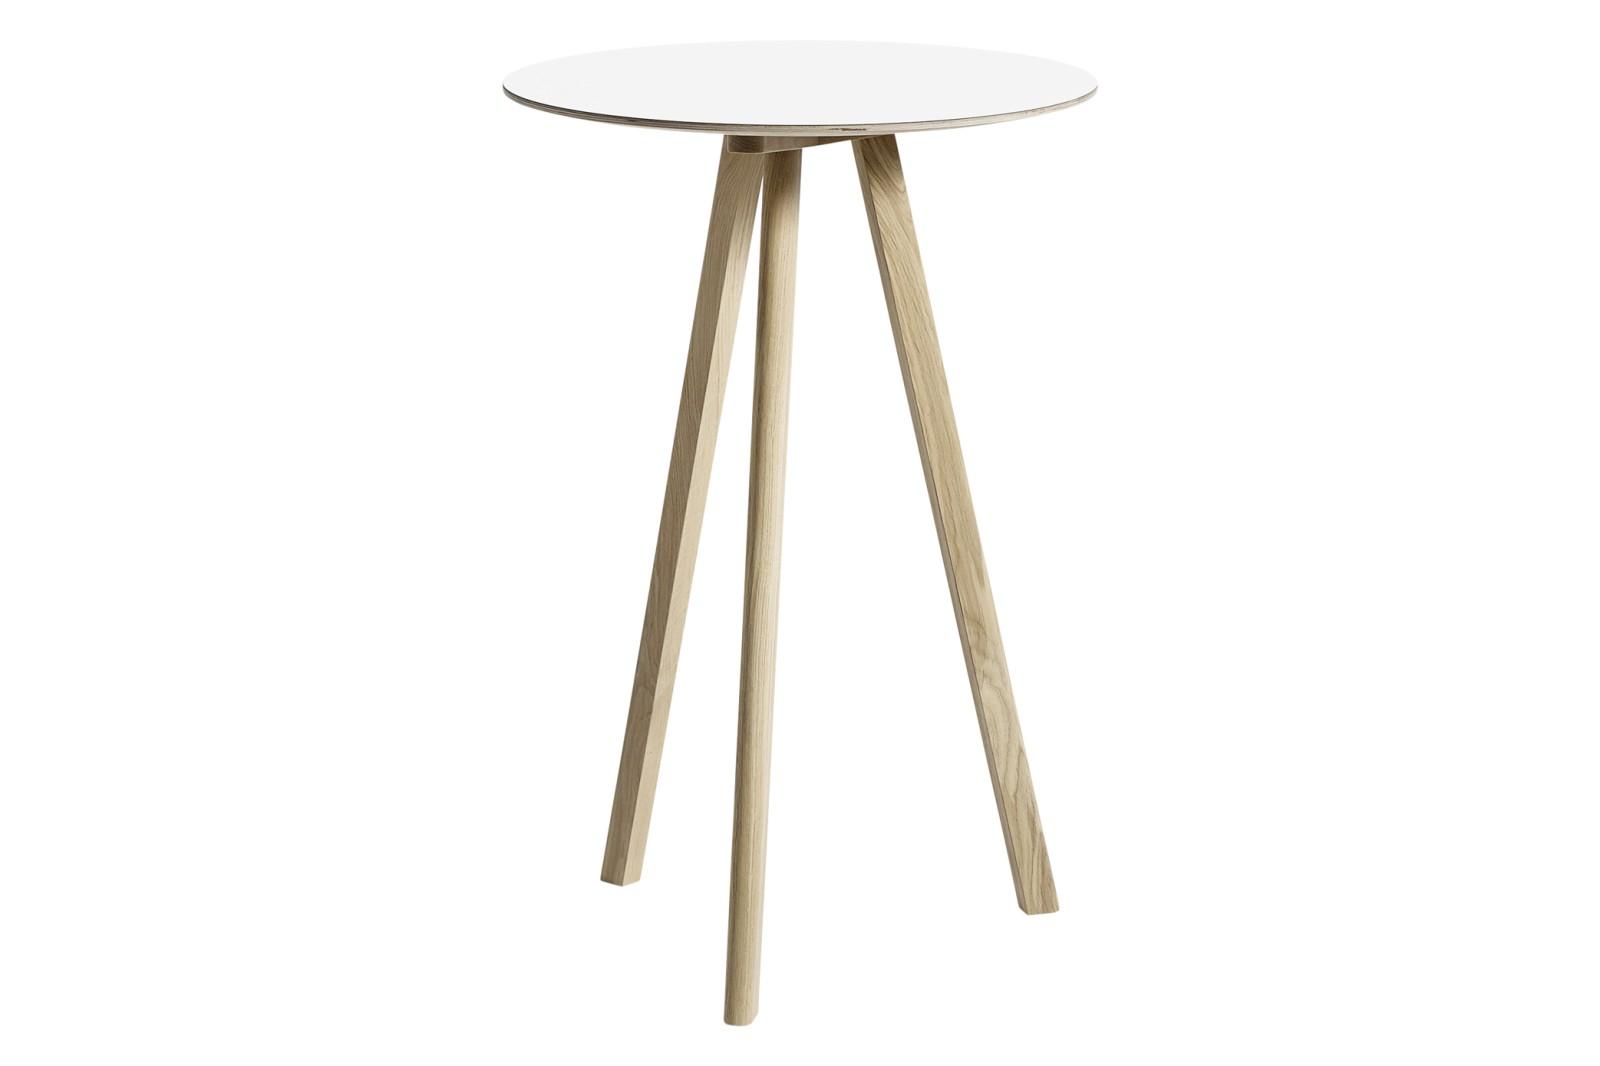 CPH 20 Round High Table Laminate White / Wood Matt Oak